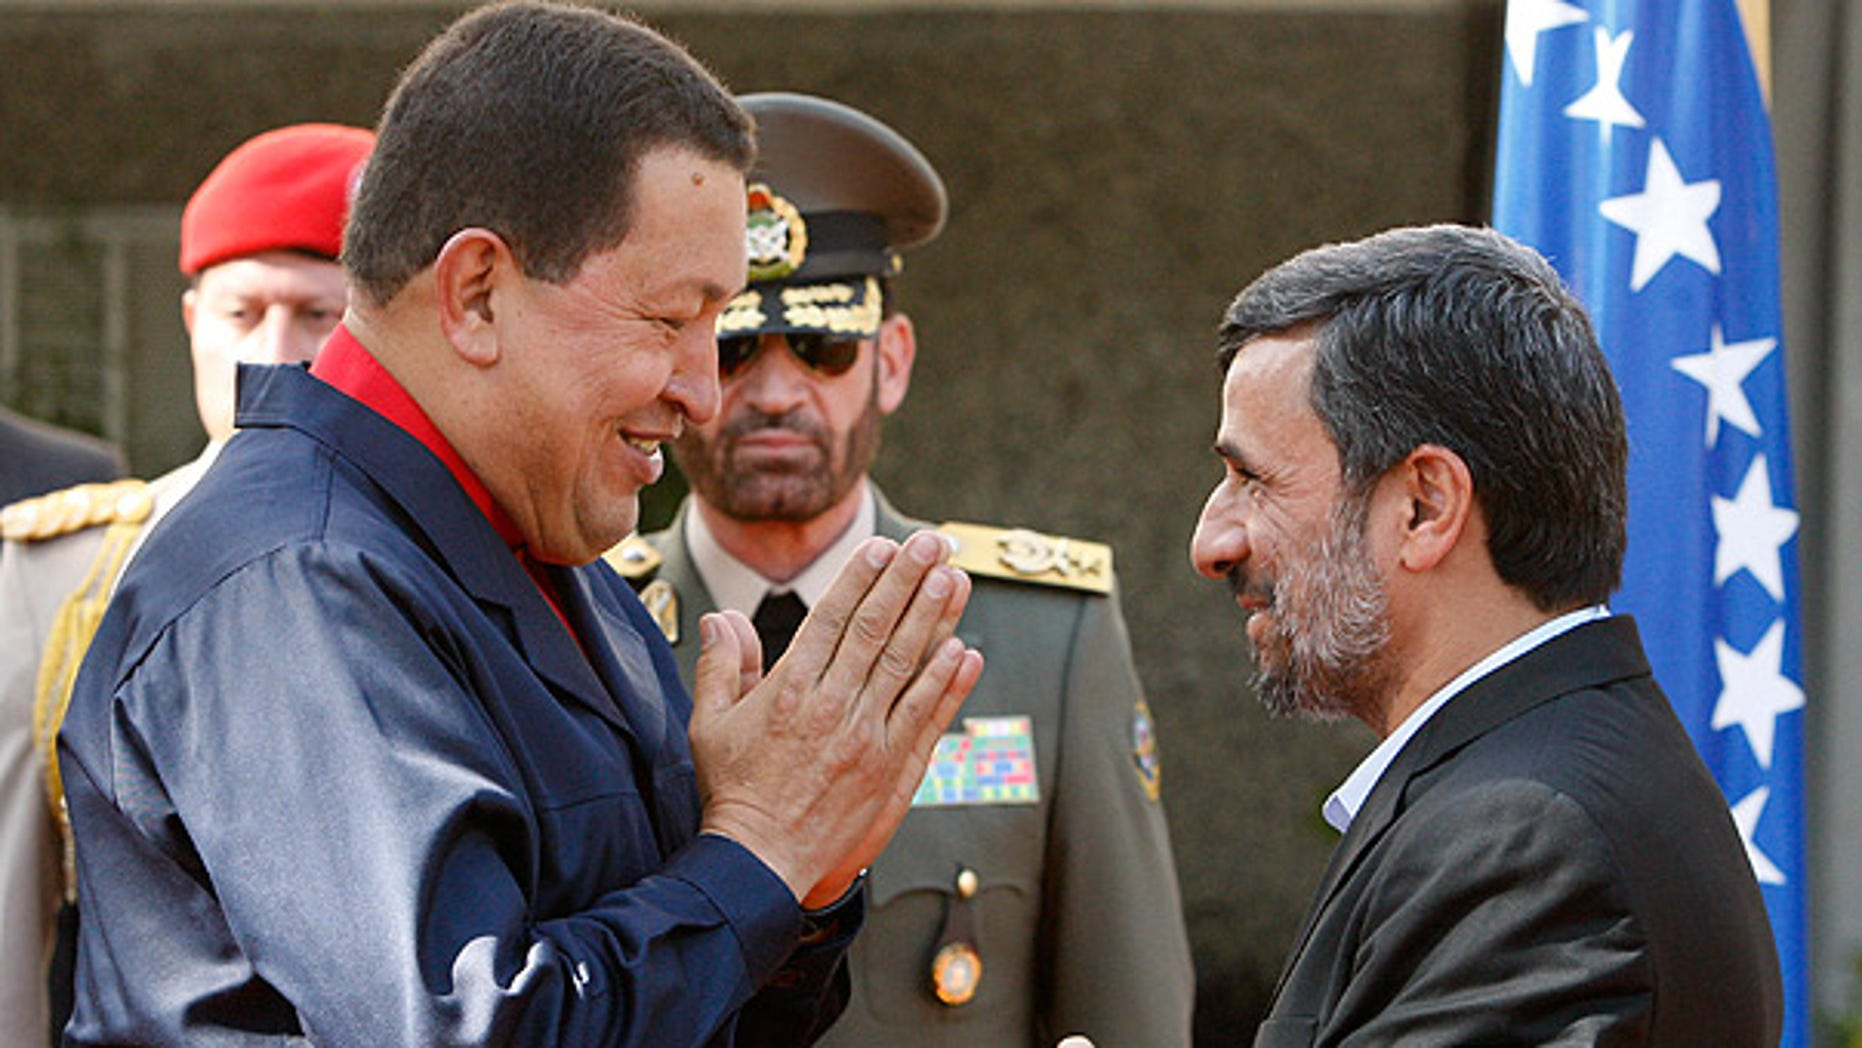 Oct. 19: Venezuelan President Hugo Chavez, left, is welcomed by his Iranian counterpart Mahmoud Ahmadinejad in Tehran.